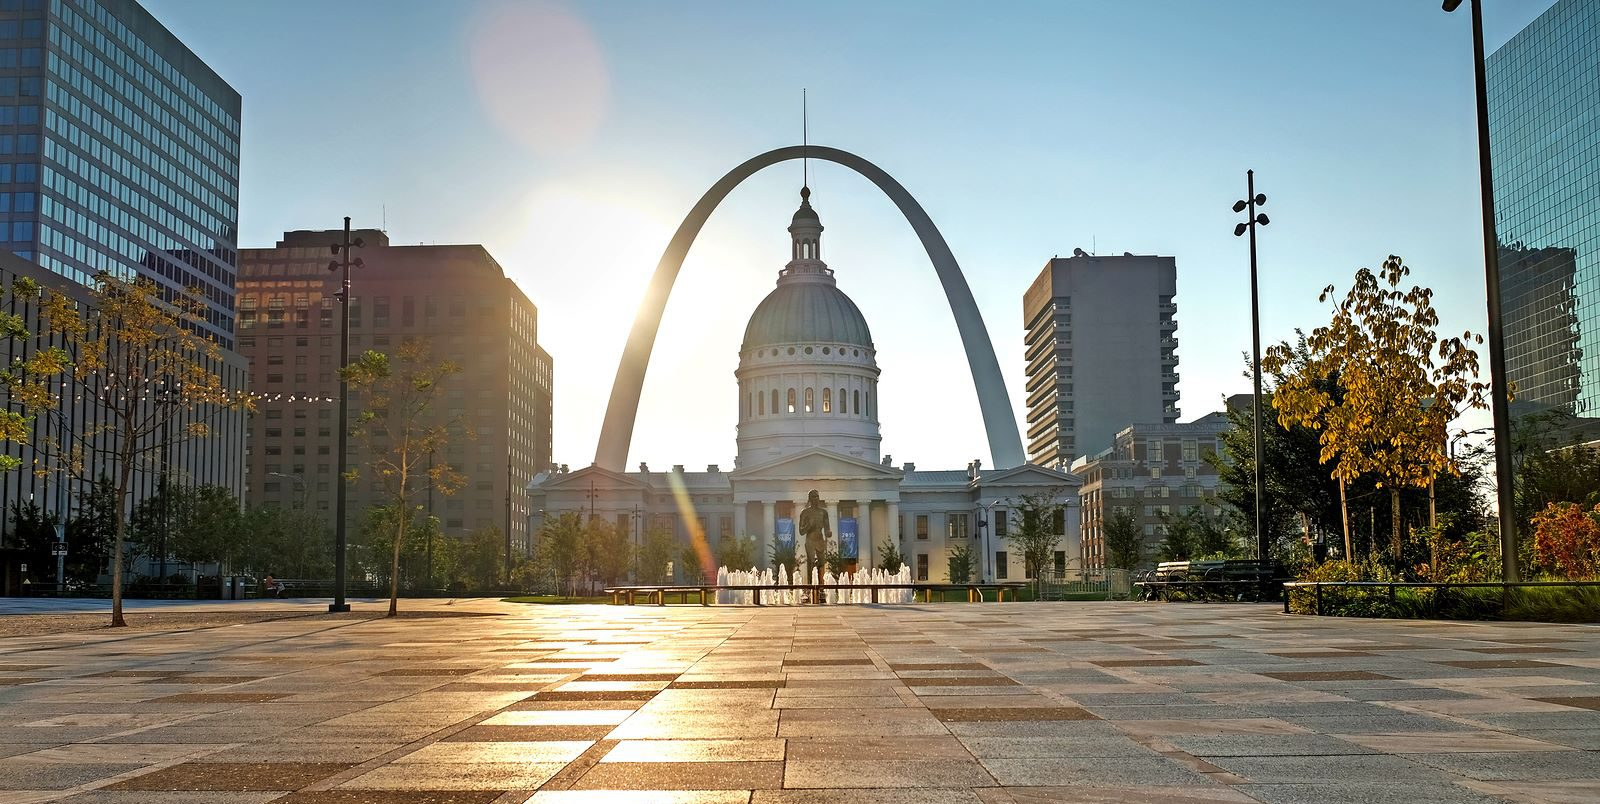 Saint Louis capital